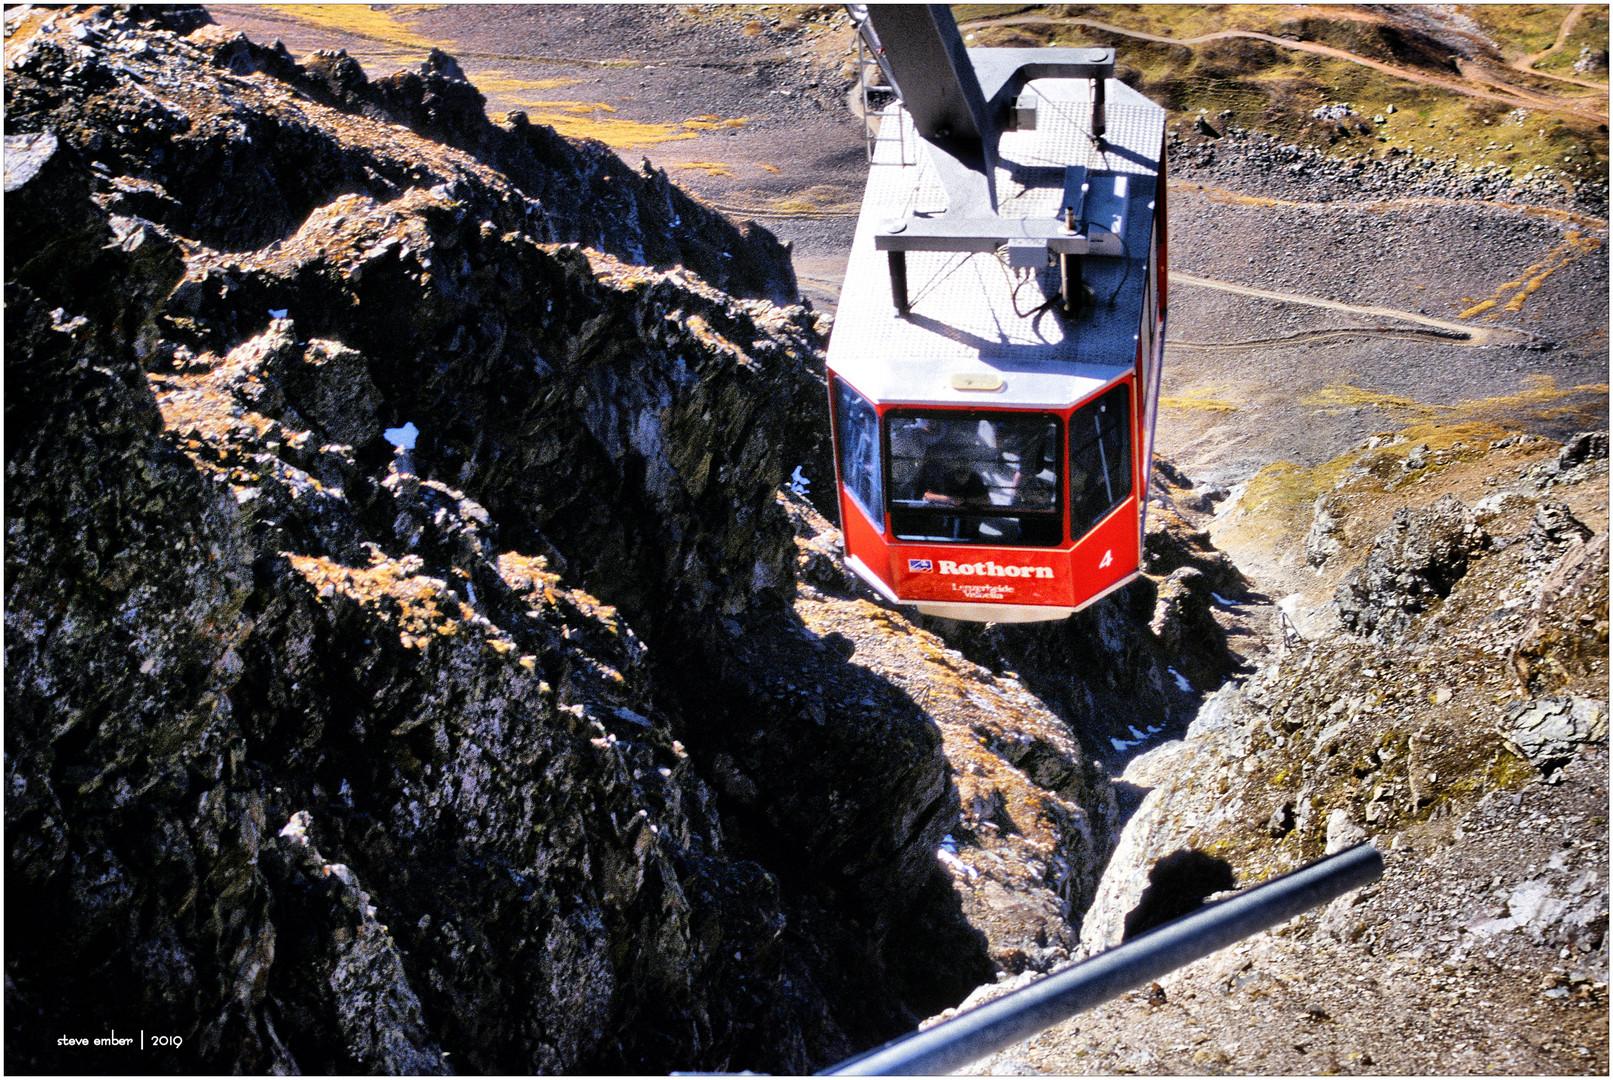 Lenzerheide Rothornbahn Aerial Cableway